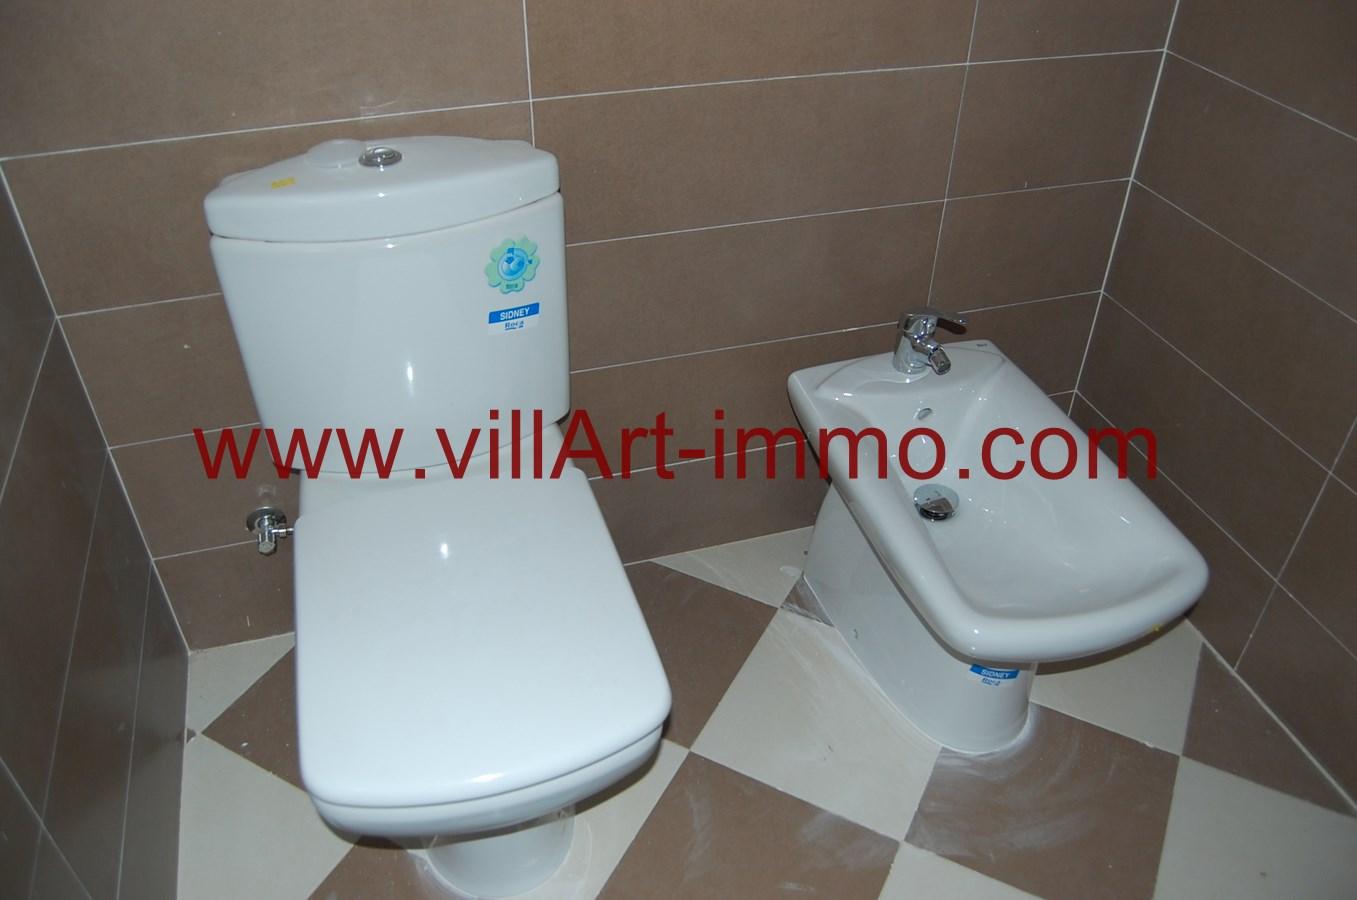 10-a-louer-appartement-non-meuble-tanger-salle-de-bain-3-l881-villart-immo